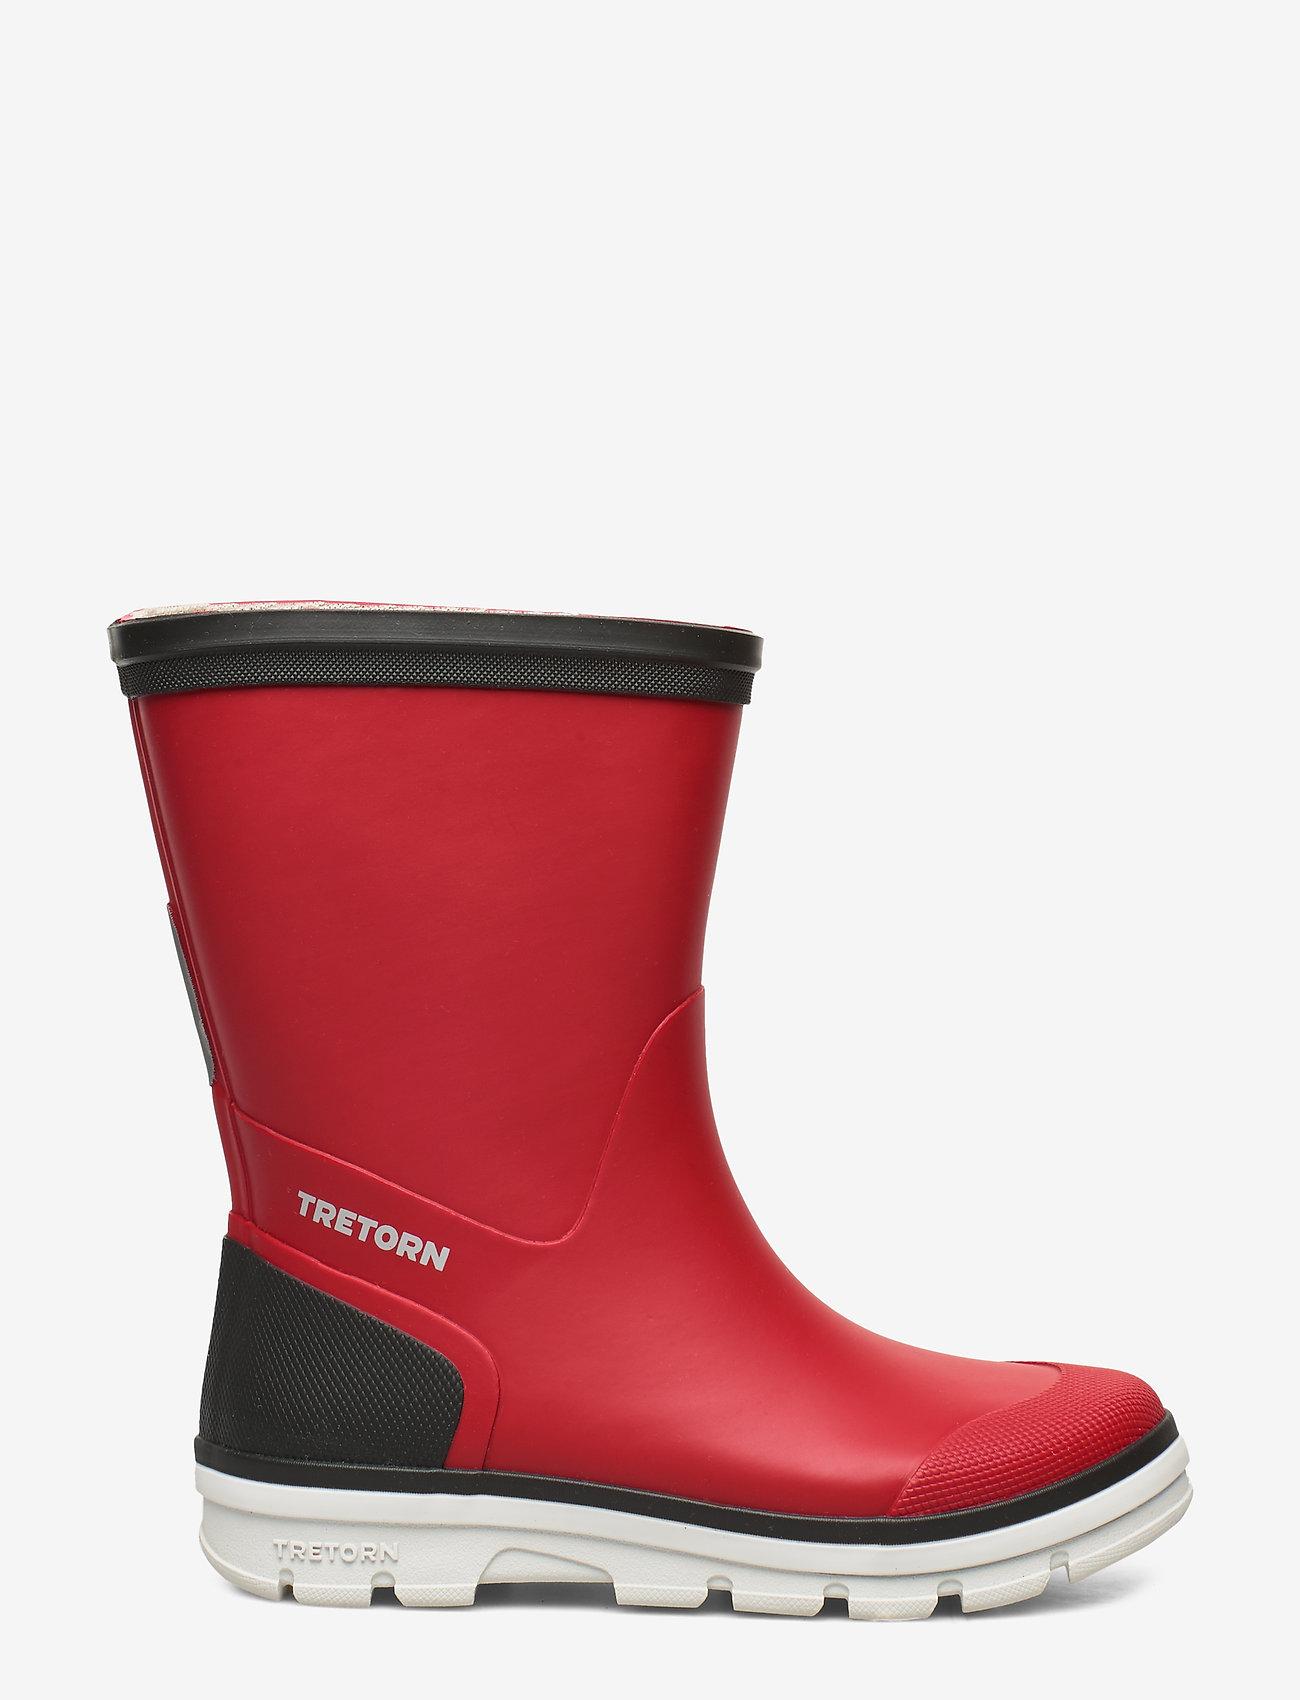 Tretorn - AKTIV - bottes en chaouthouc - red/grey - 1